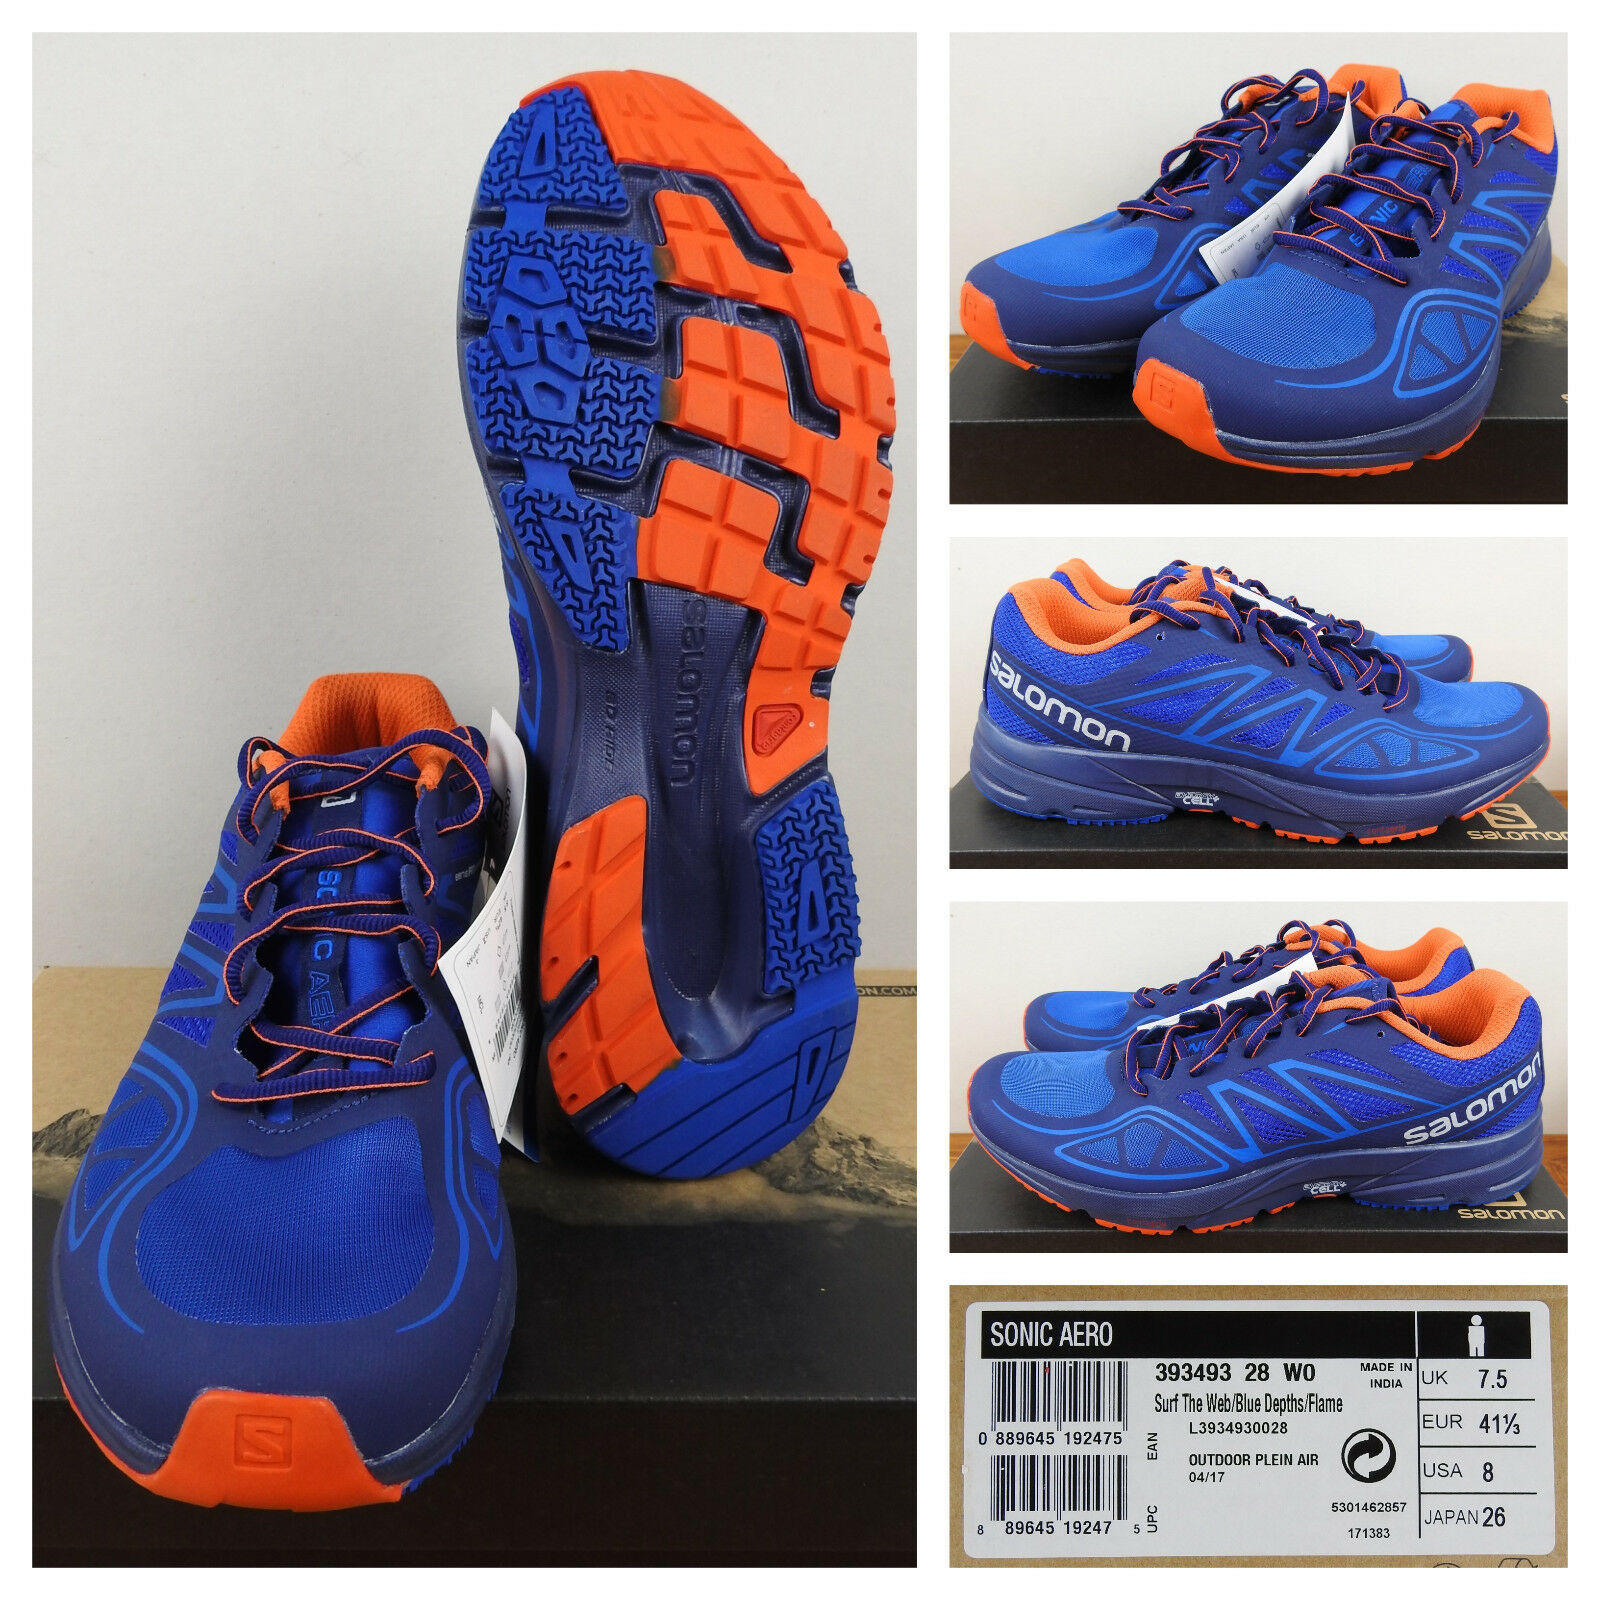 Salomon Uomo Running Shoes Trail Cross Country Breathable Mesh Blue Orange 8